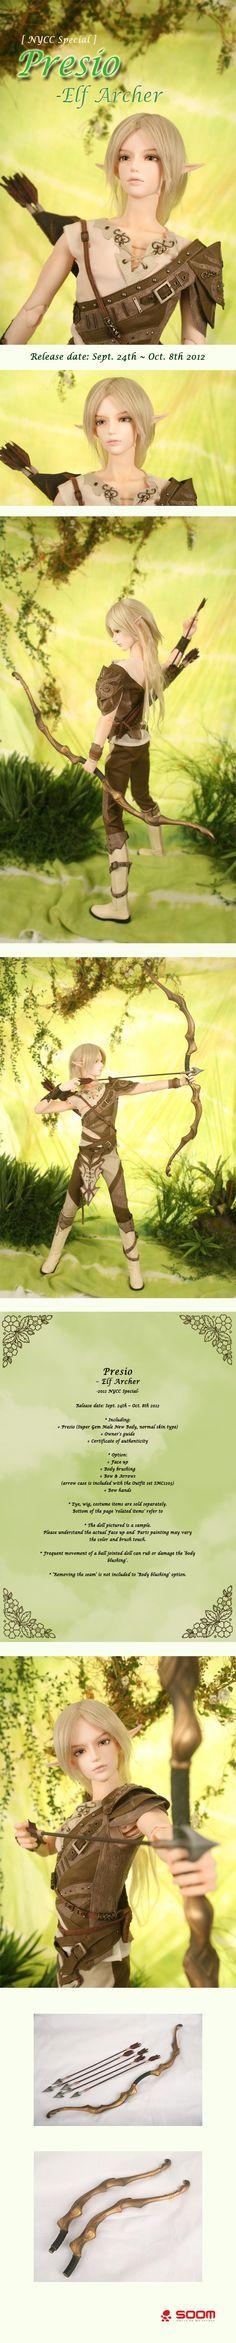 the SOOM emporium Presio - Elf Archer #bjd